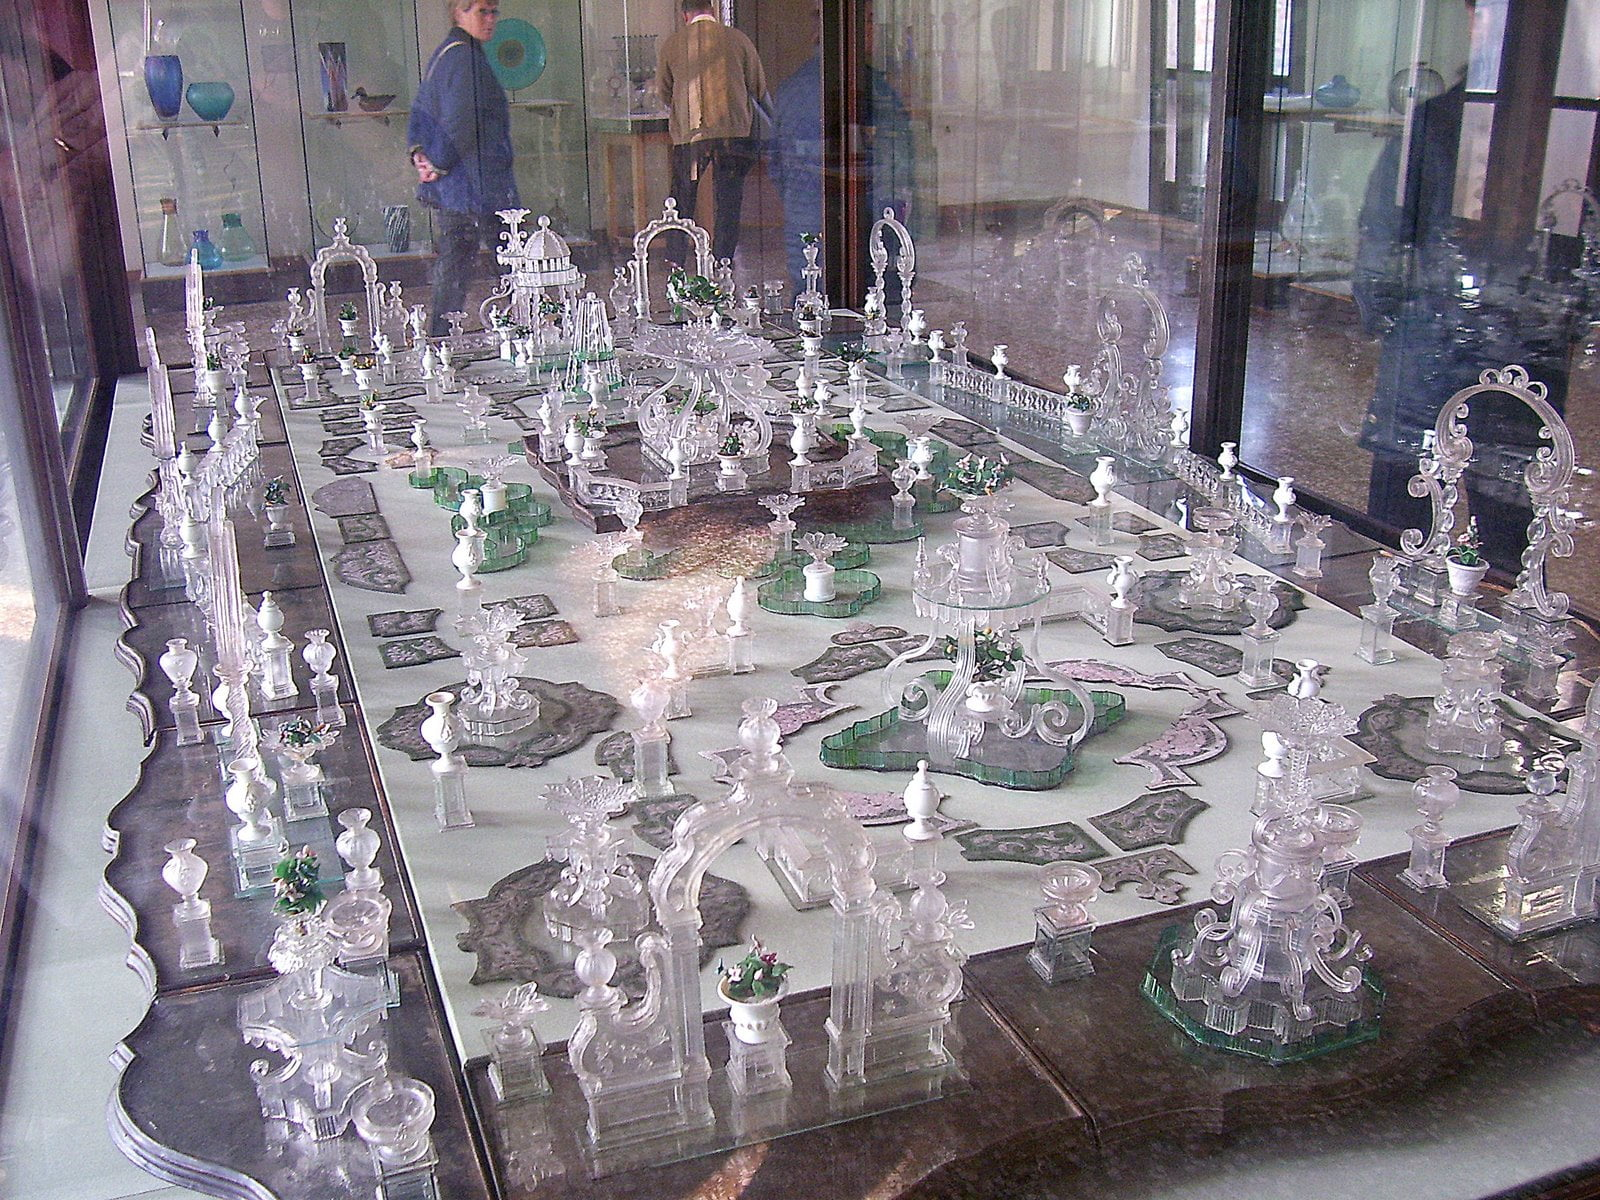 Cristales del Museo de Murano